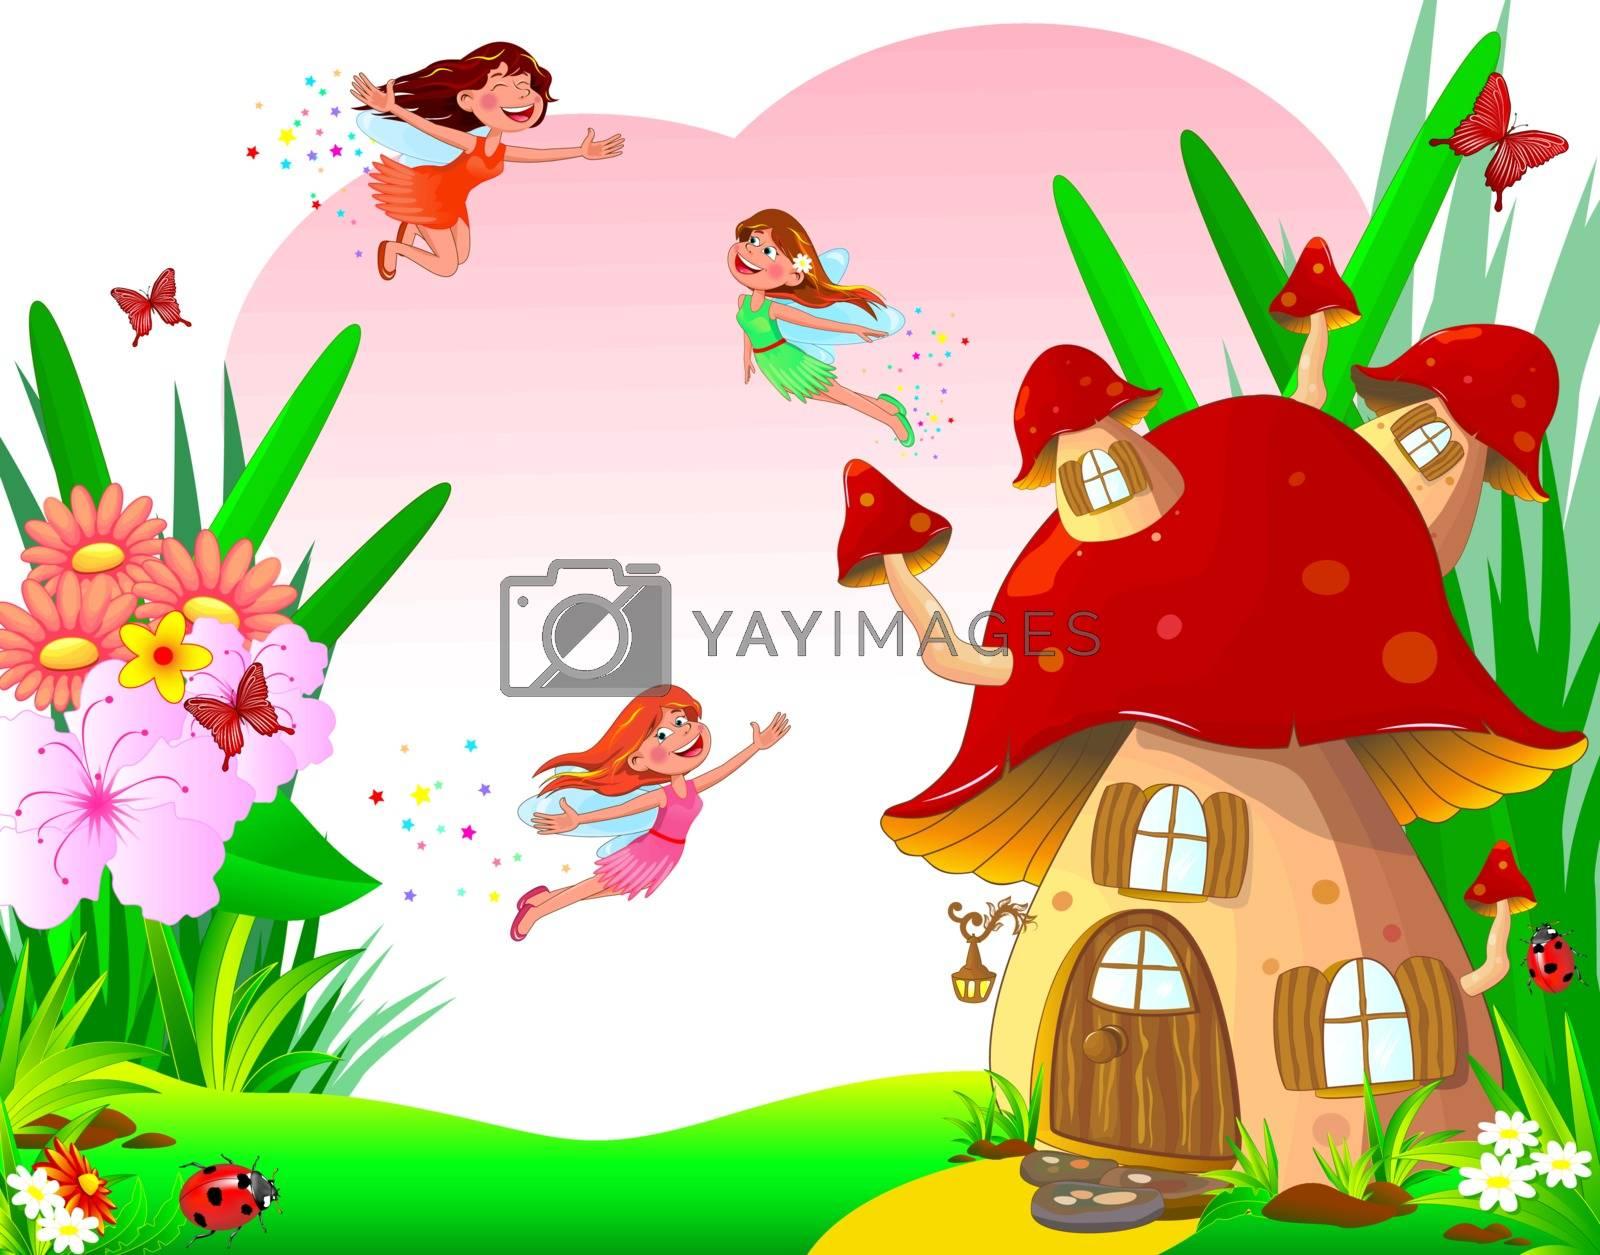 Happy little fairies fly among the flowers. Fairytale mushroom house, flowers, butterflies and ladybugs.